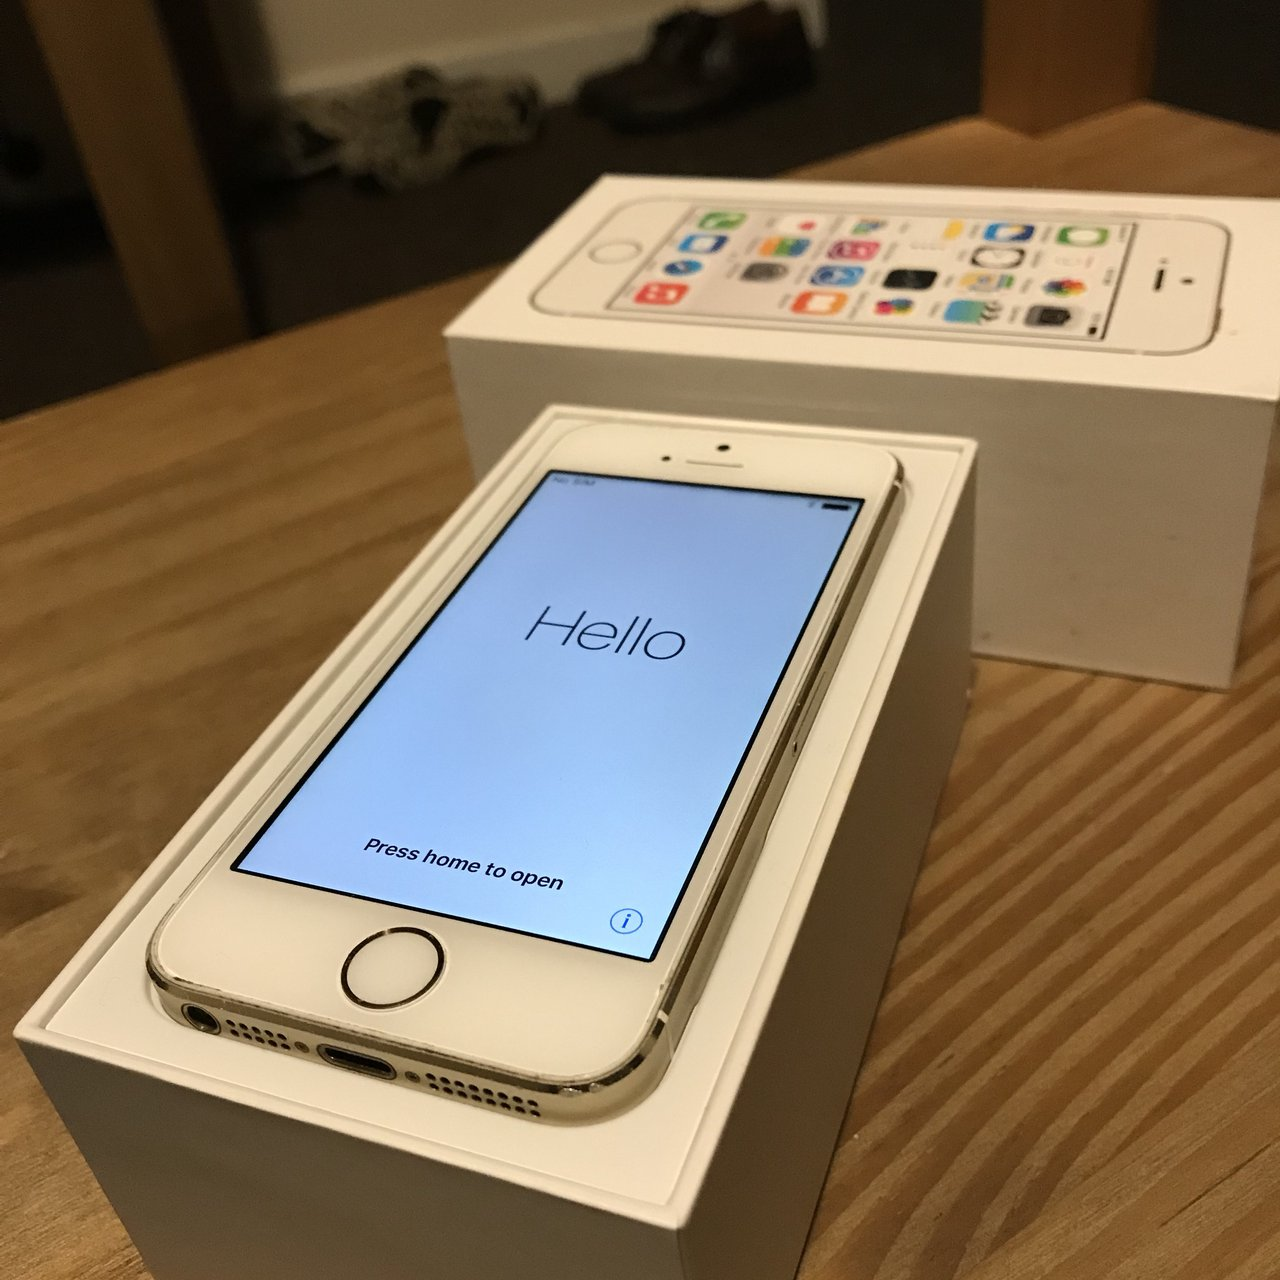 iPhone 5s Price In Ghana  iPhones  Reapp Ghana